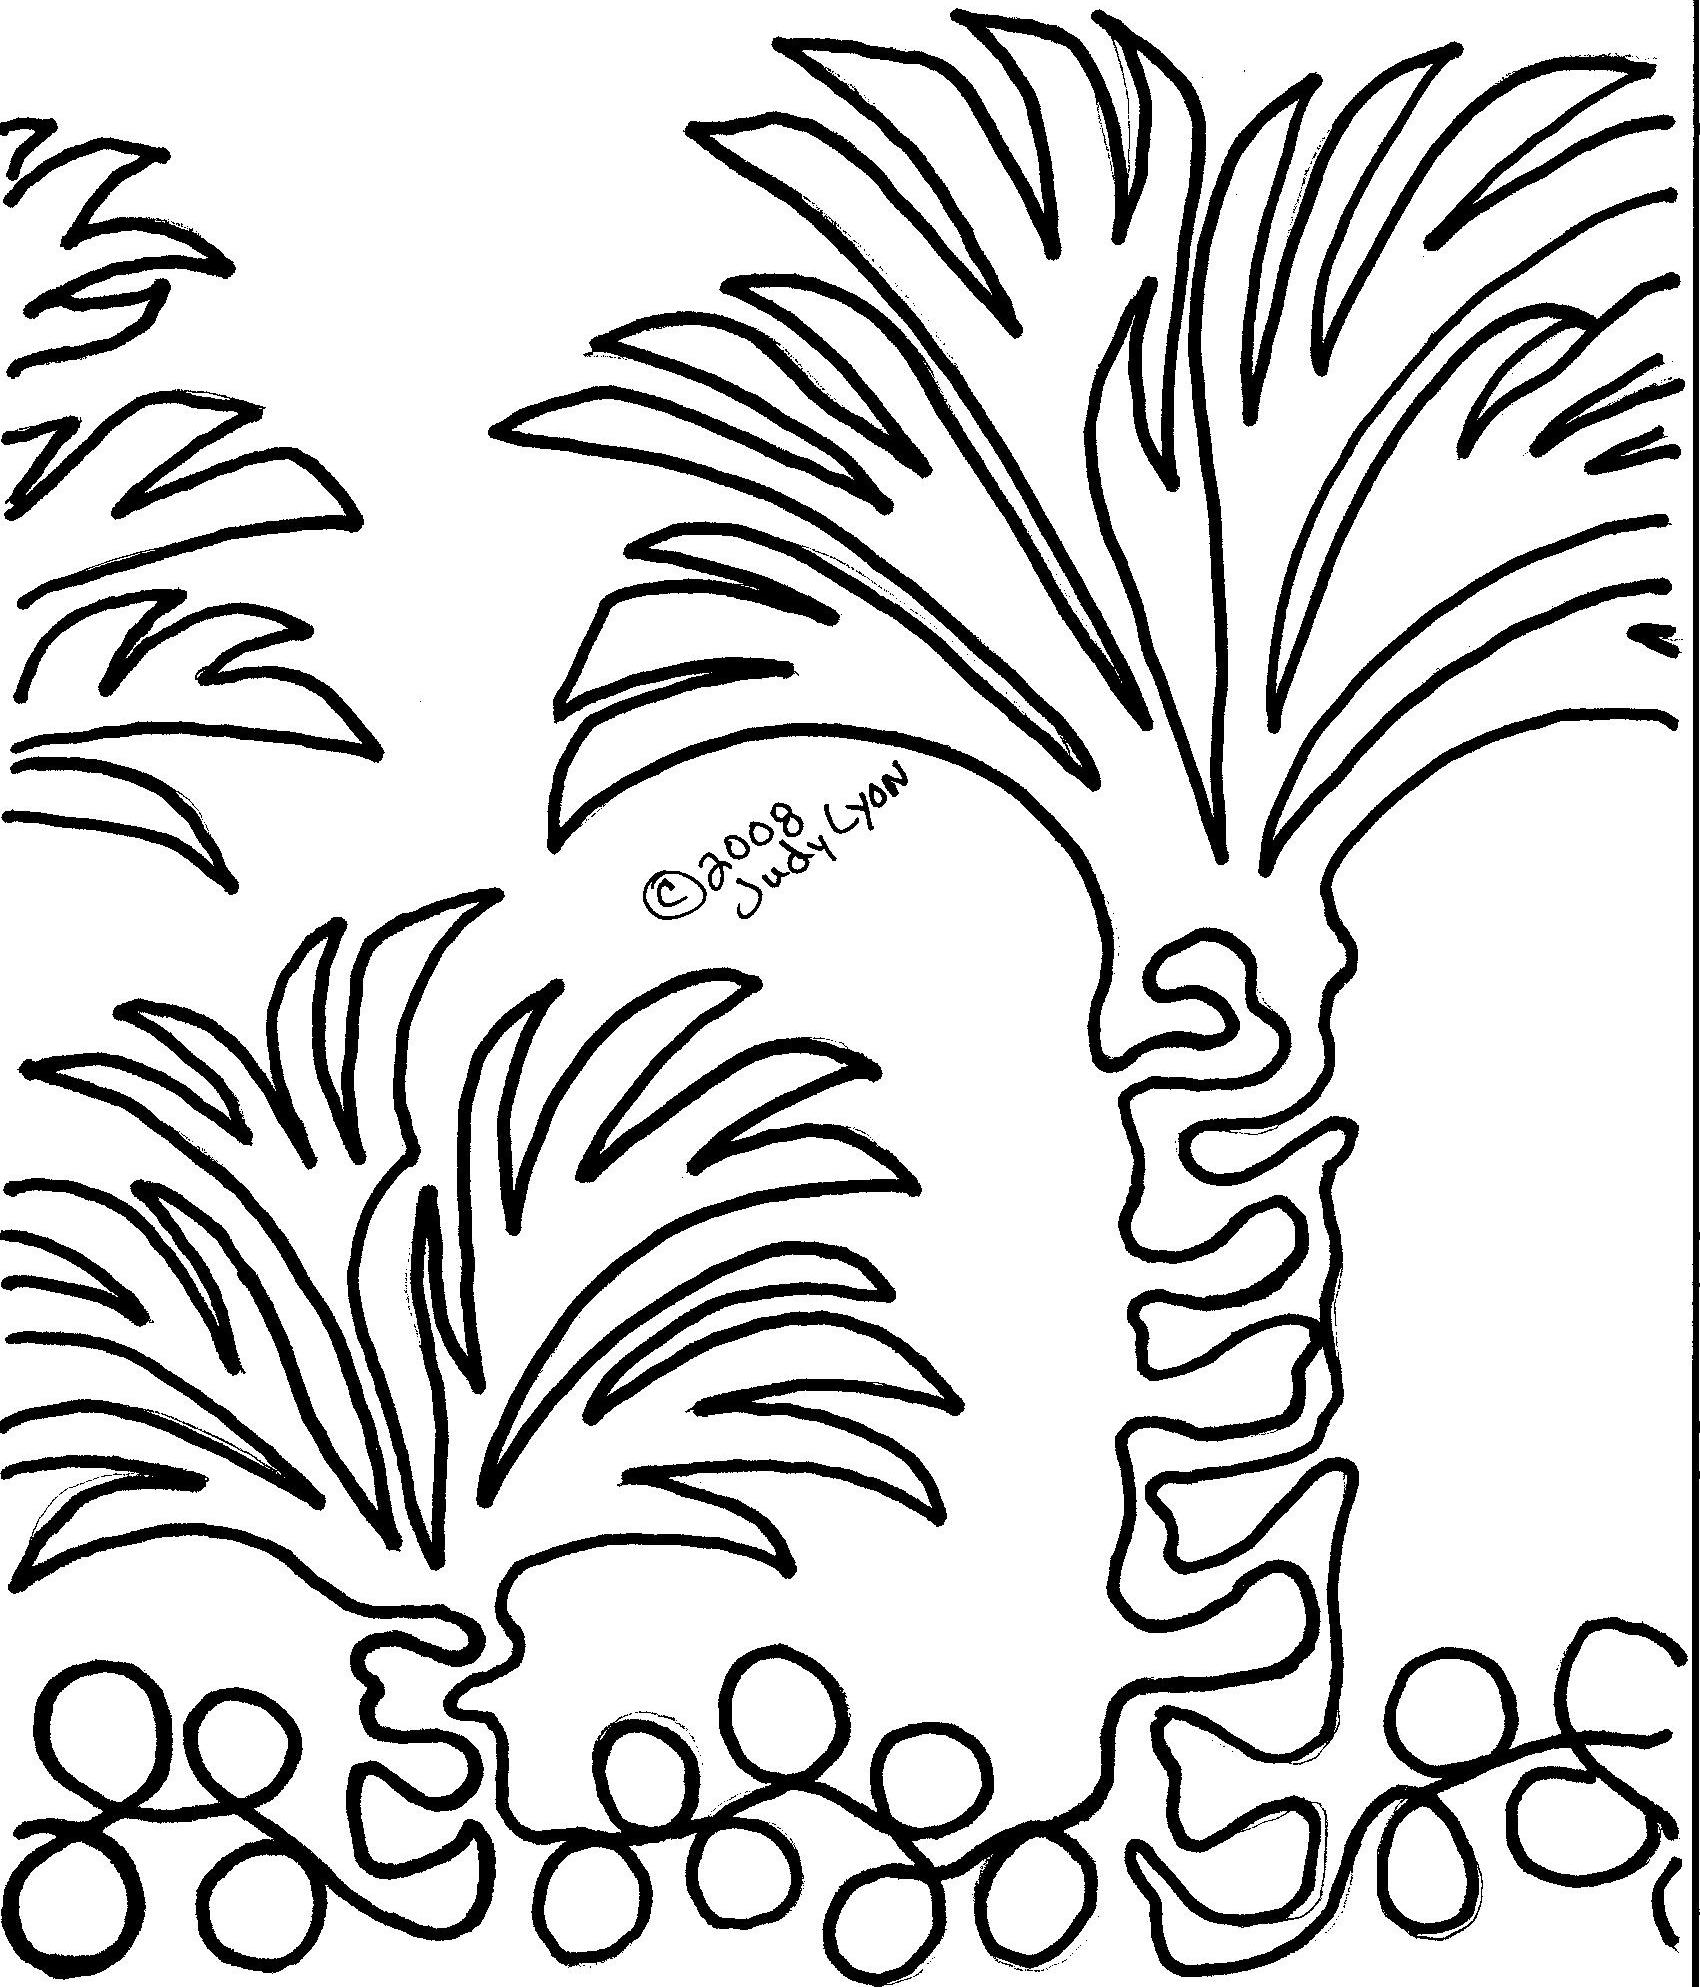 Palm Trees - Border